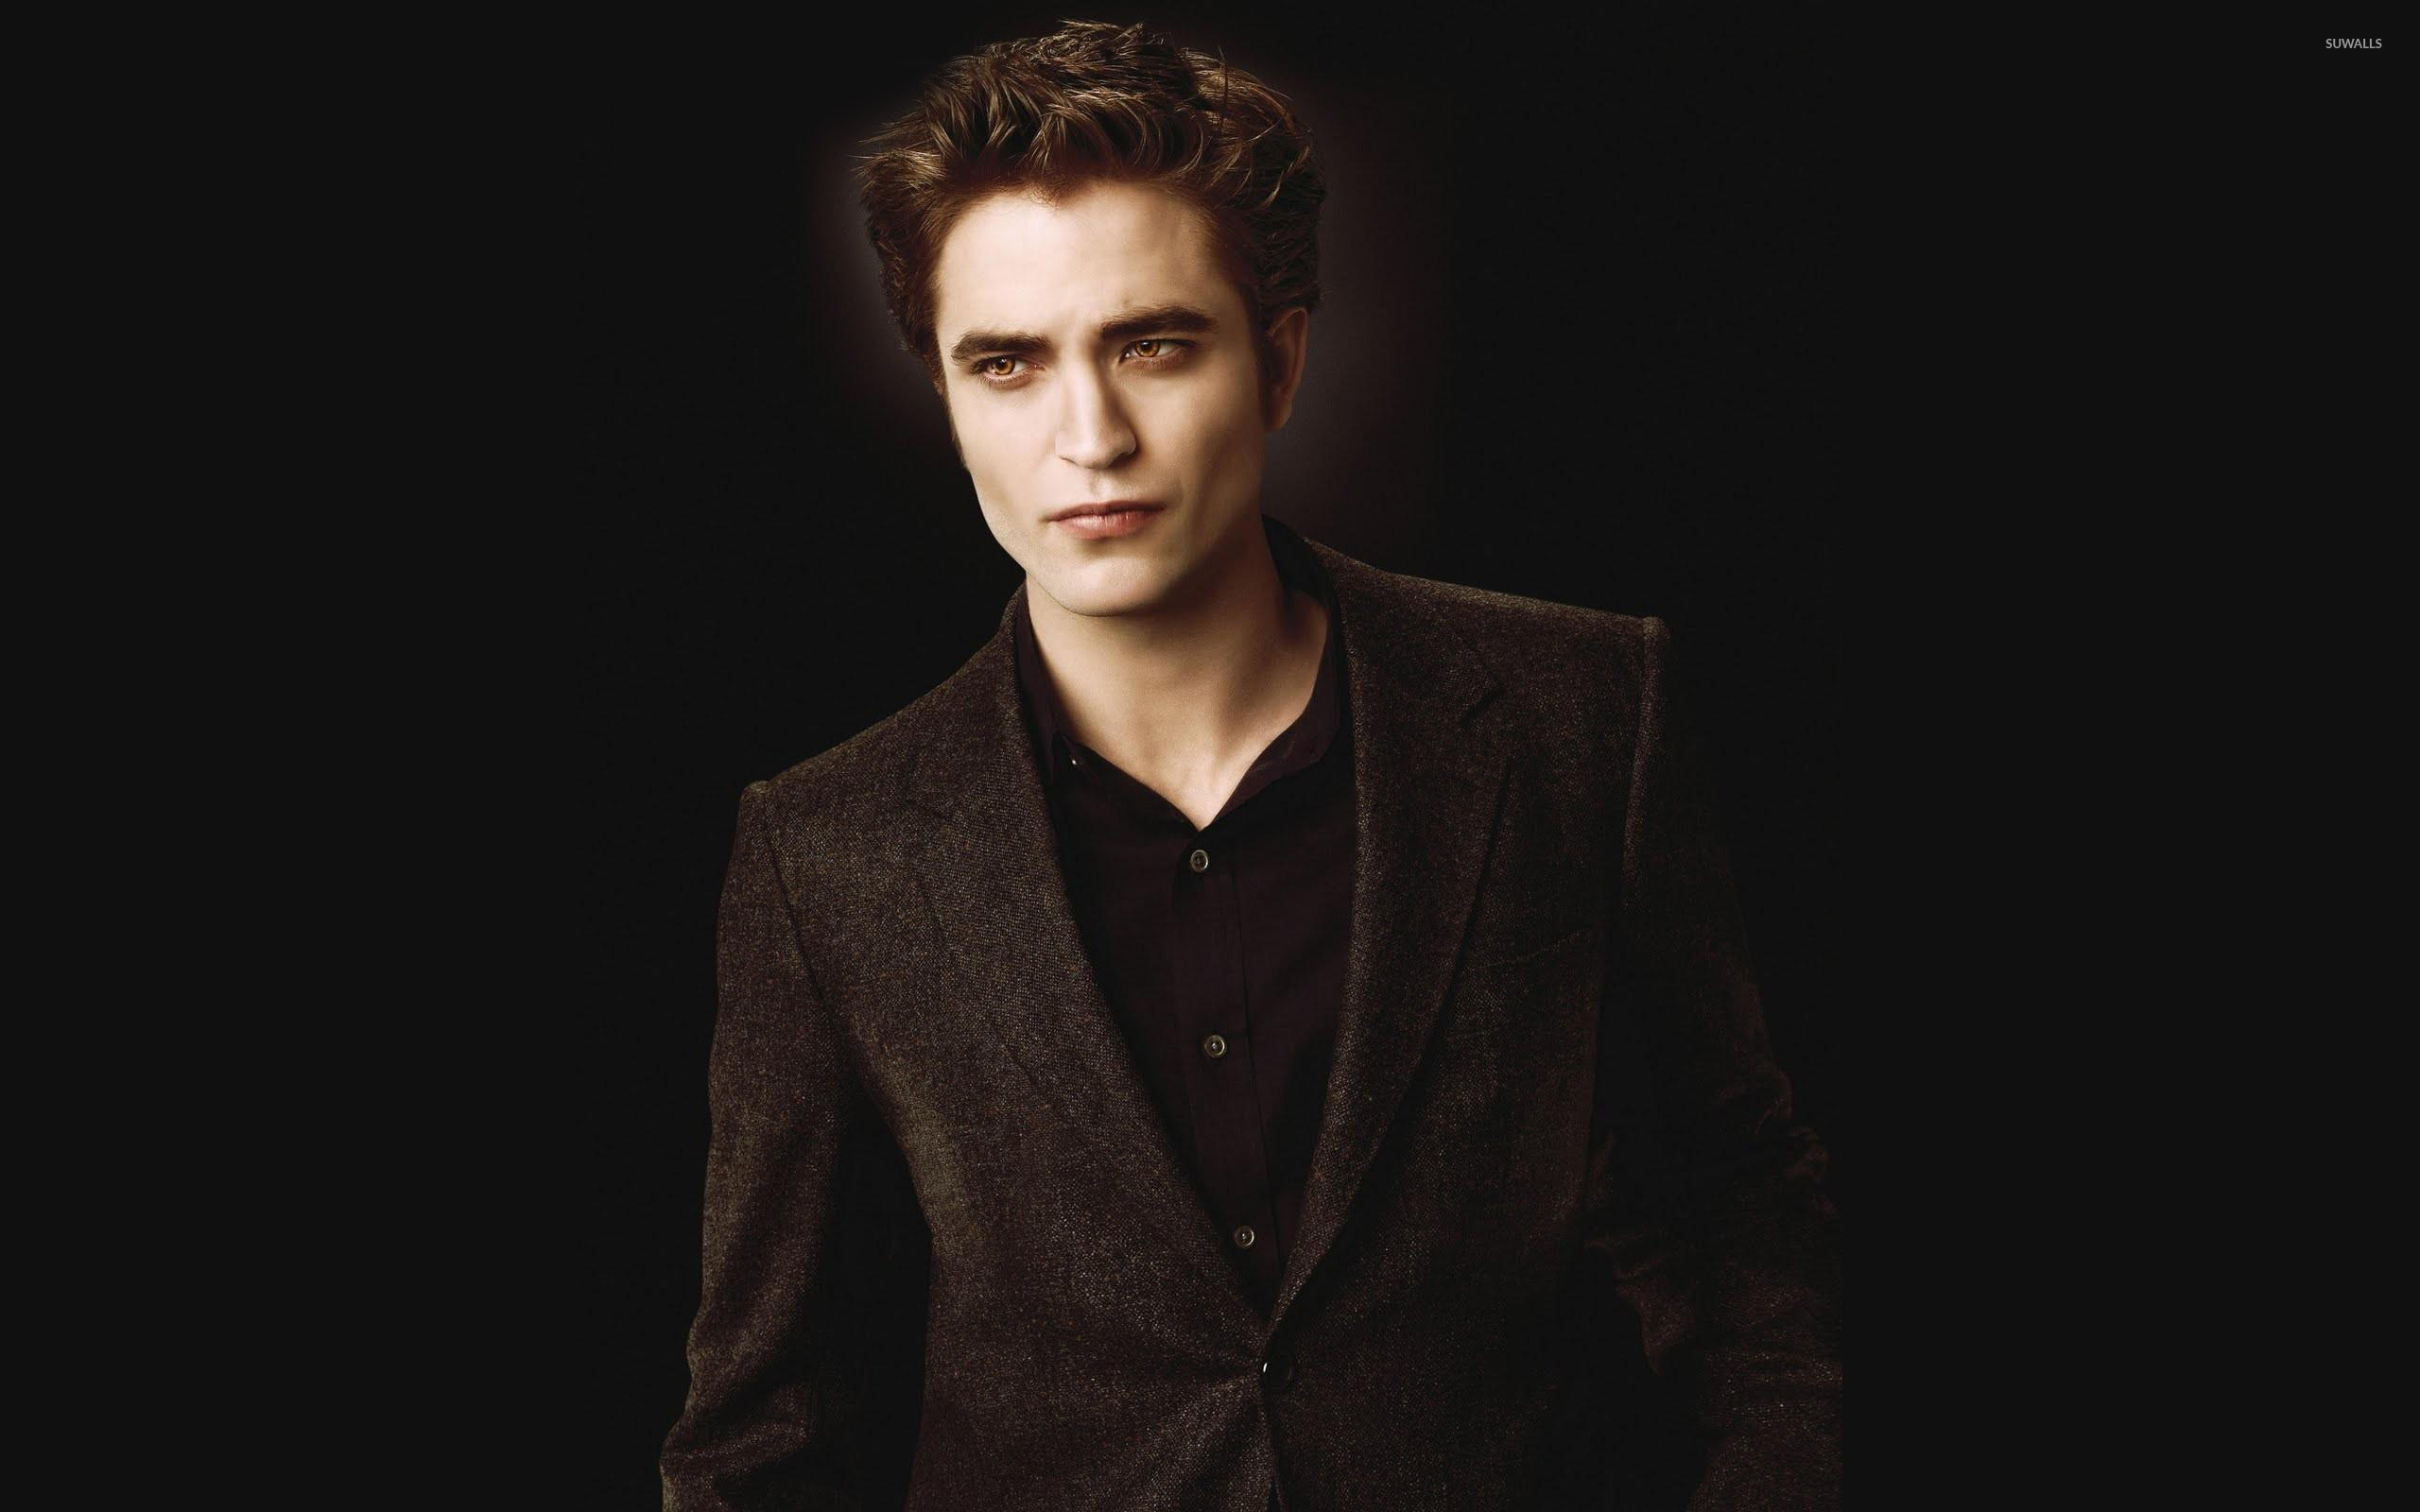 Edward Cullen Wallpapers